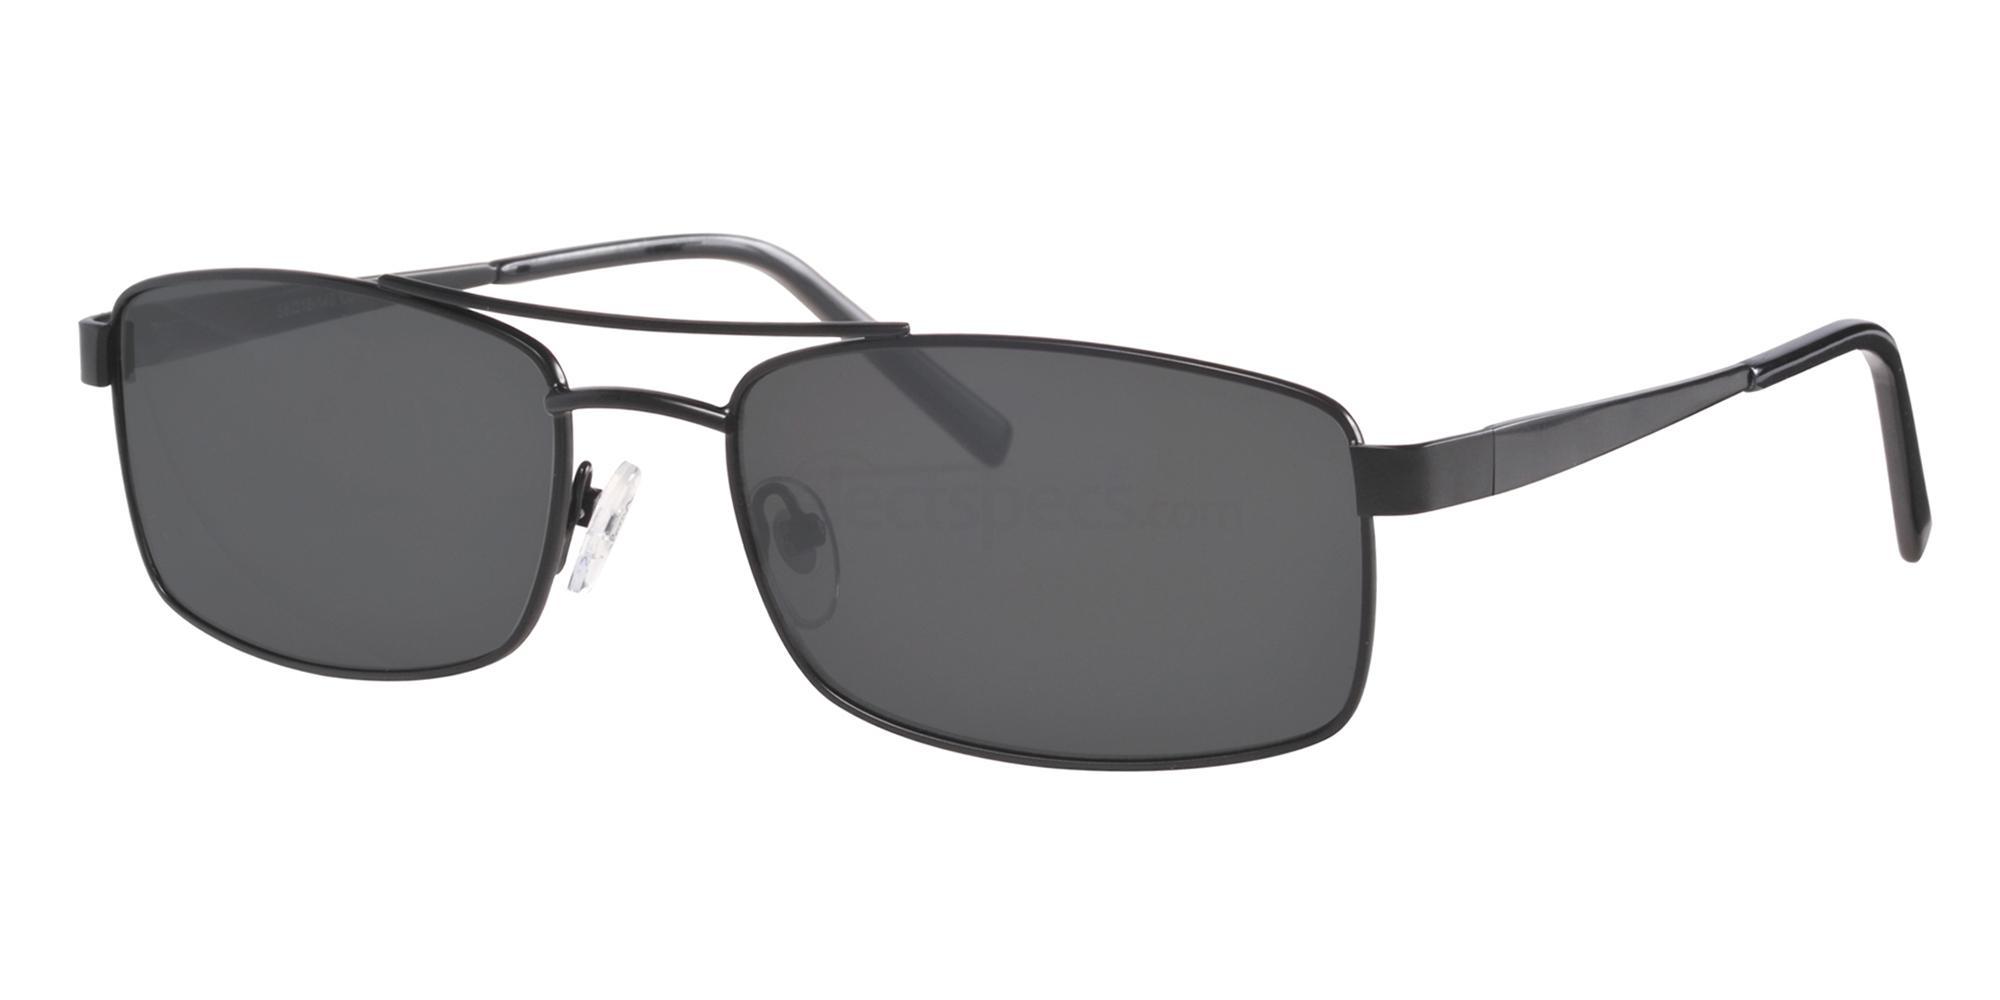 C01 VS182 Sunglasses, Visage